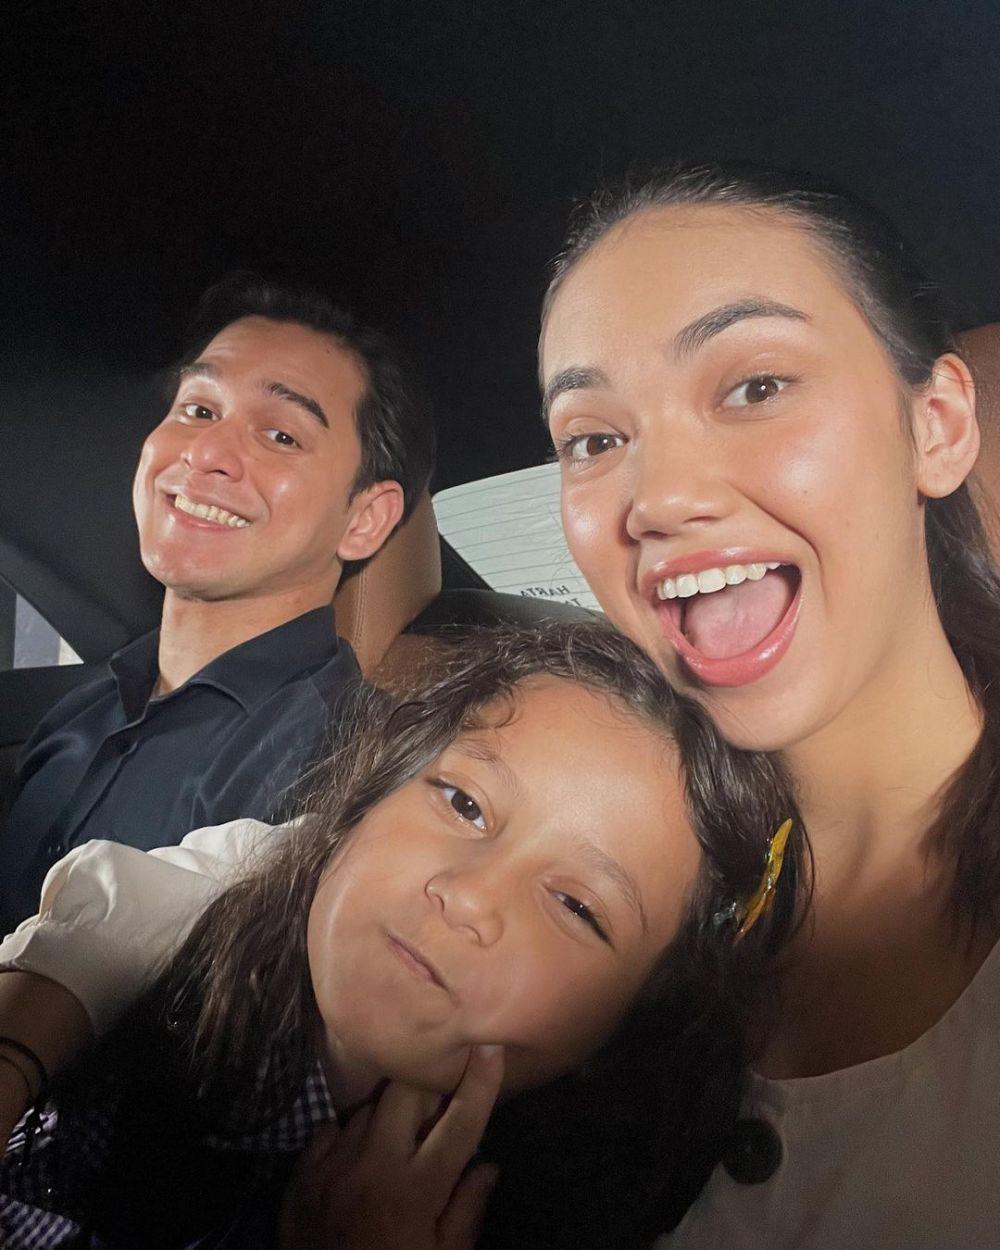 Keluarga di sinetron harmonis © Instagram